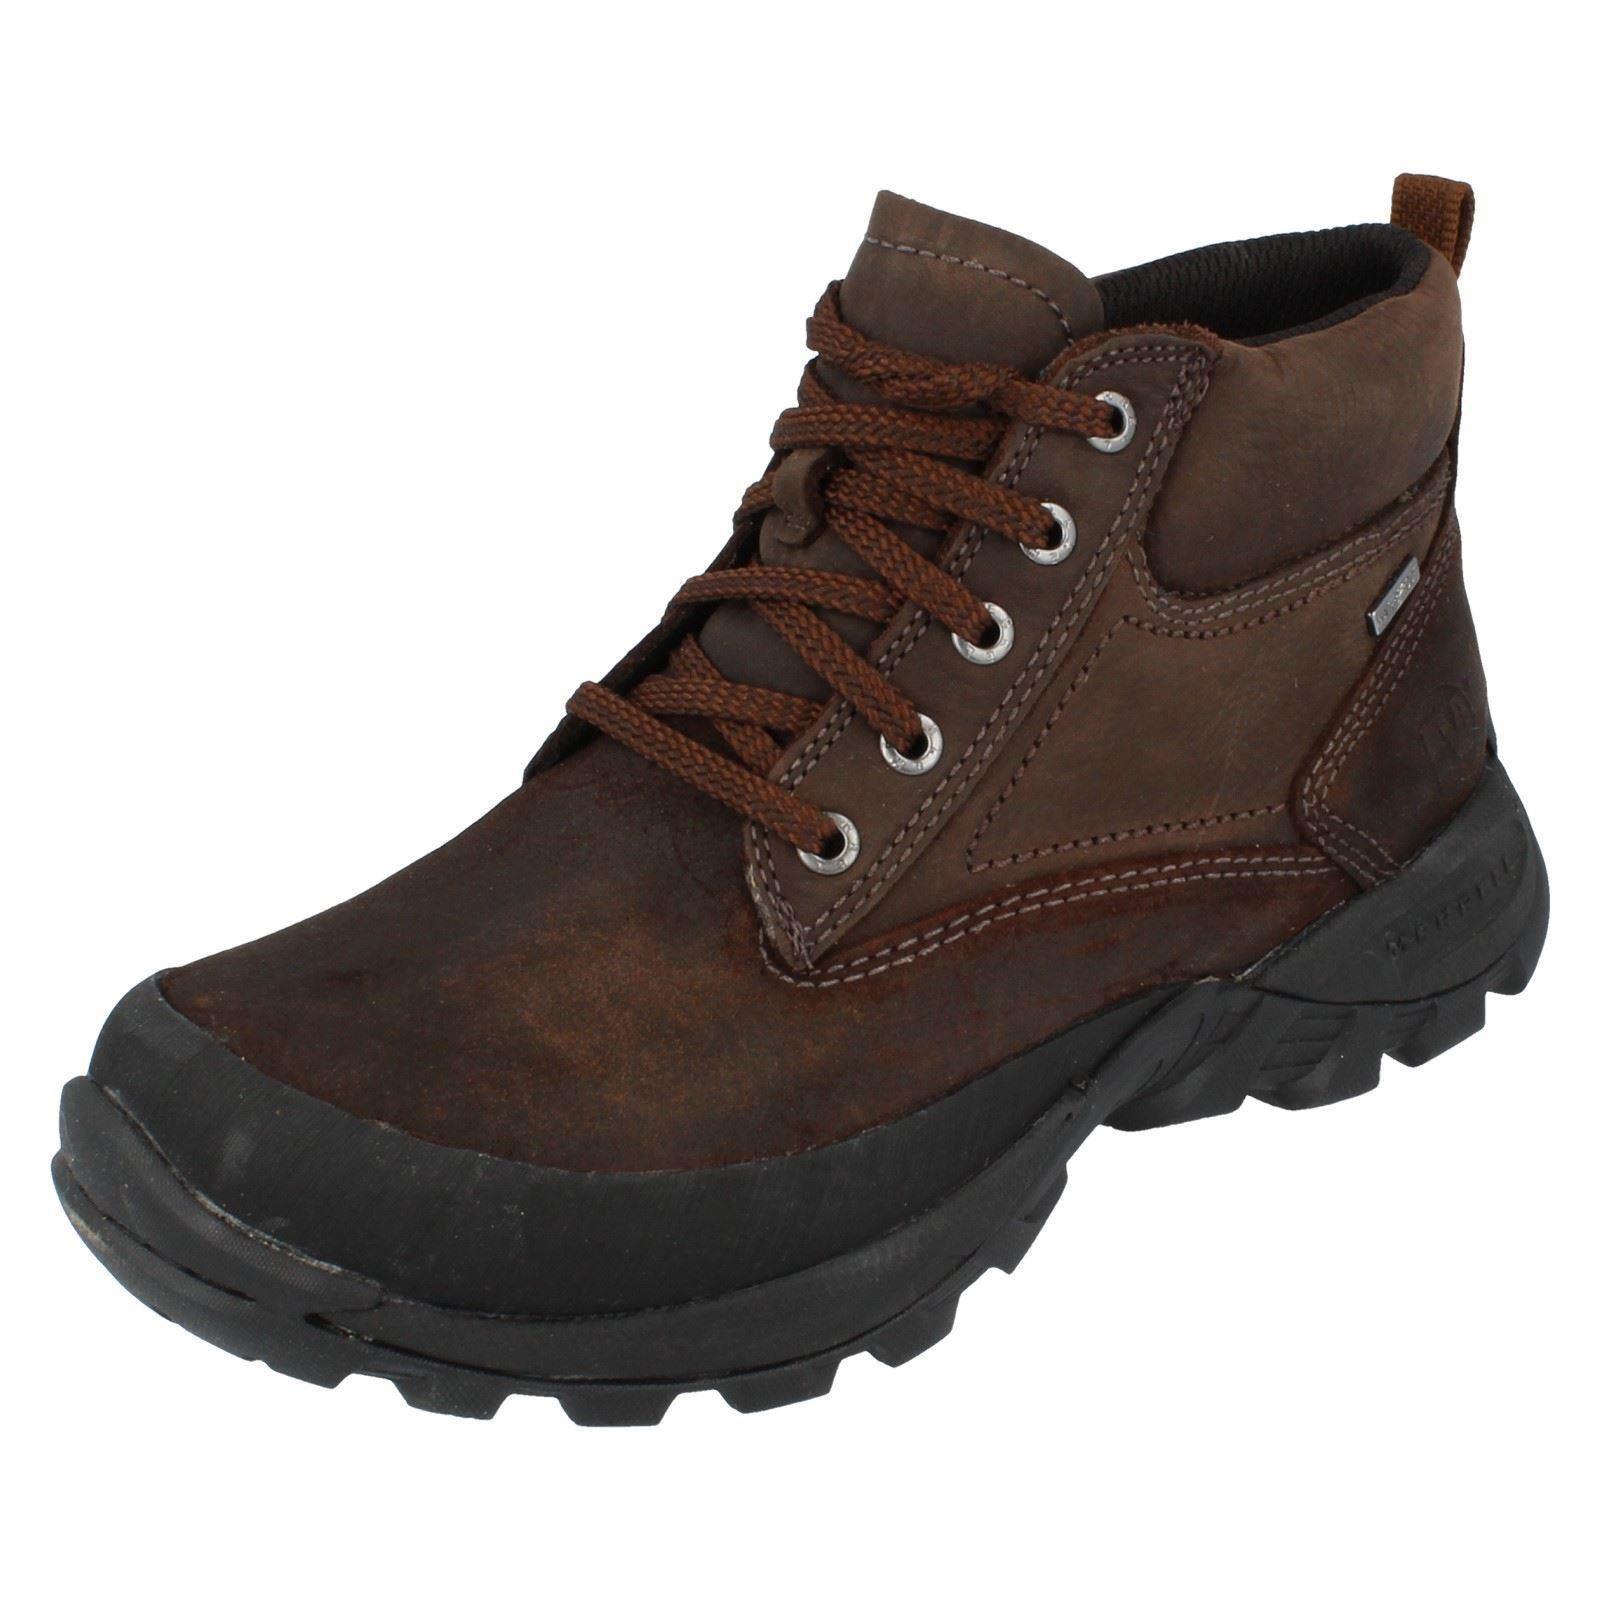 Uomo Merrell Leder Lace Waterproof' Up Ankle Stiefel 'Arlberg Waterproof' Lace 737c35